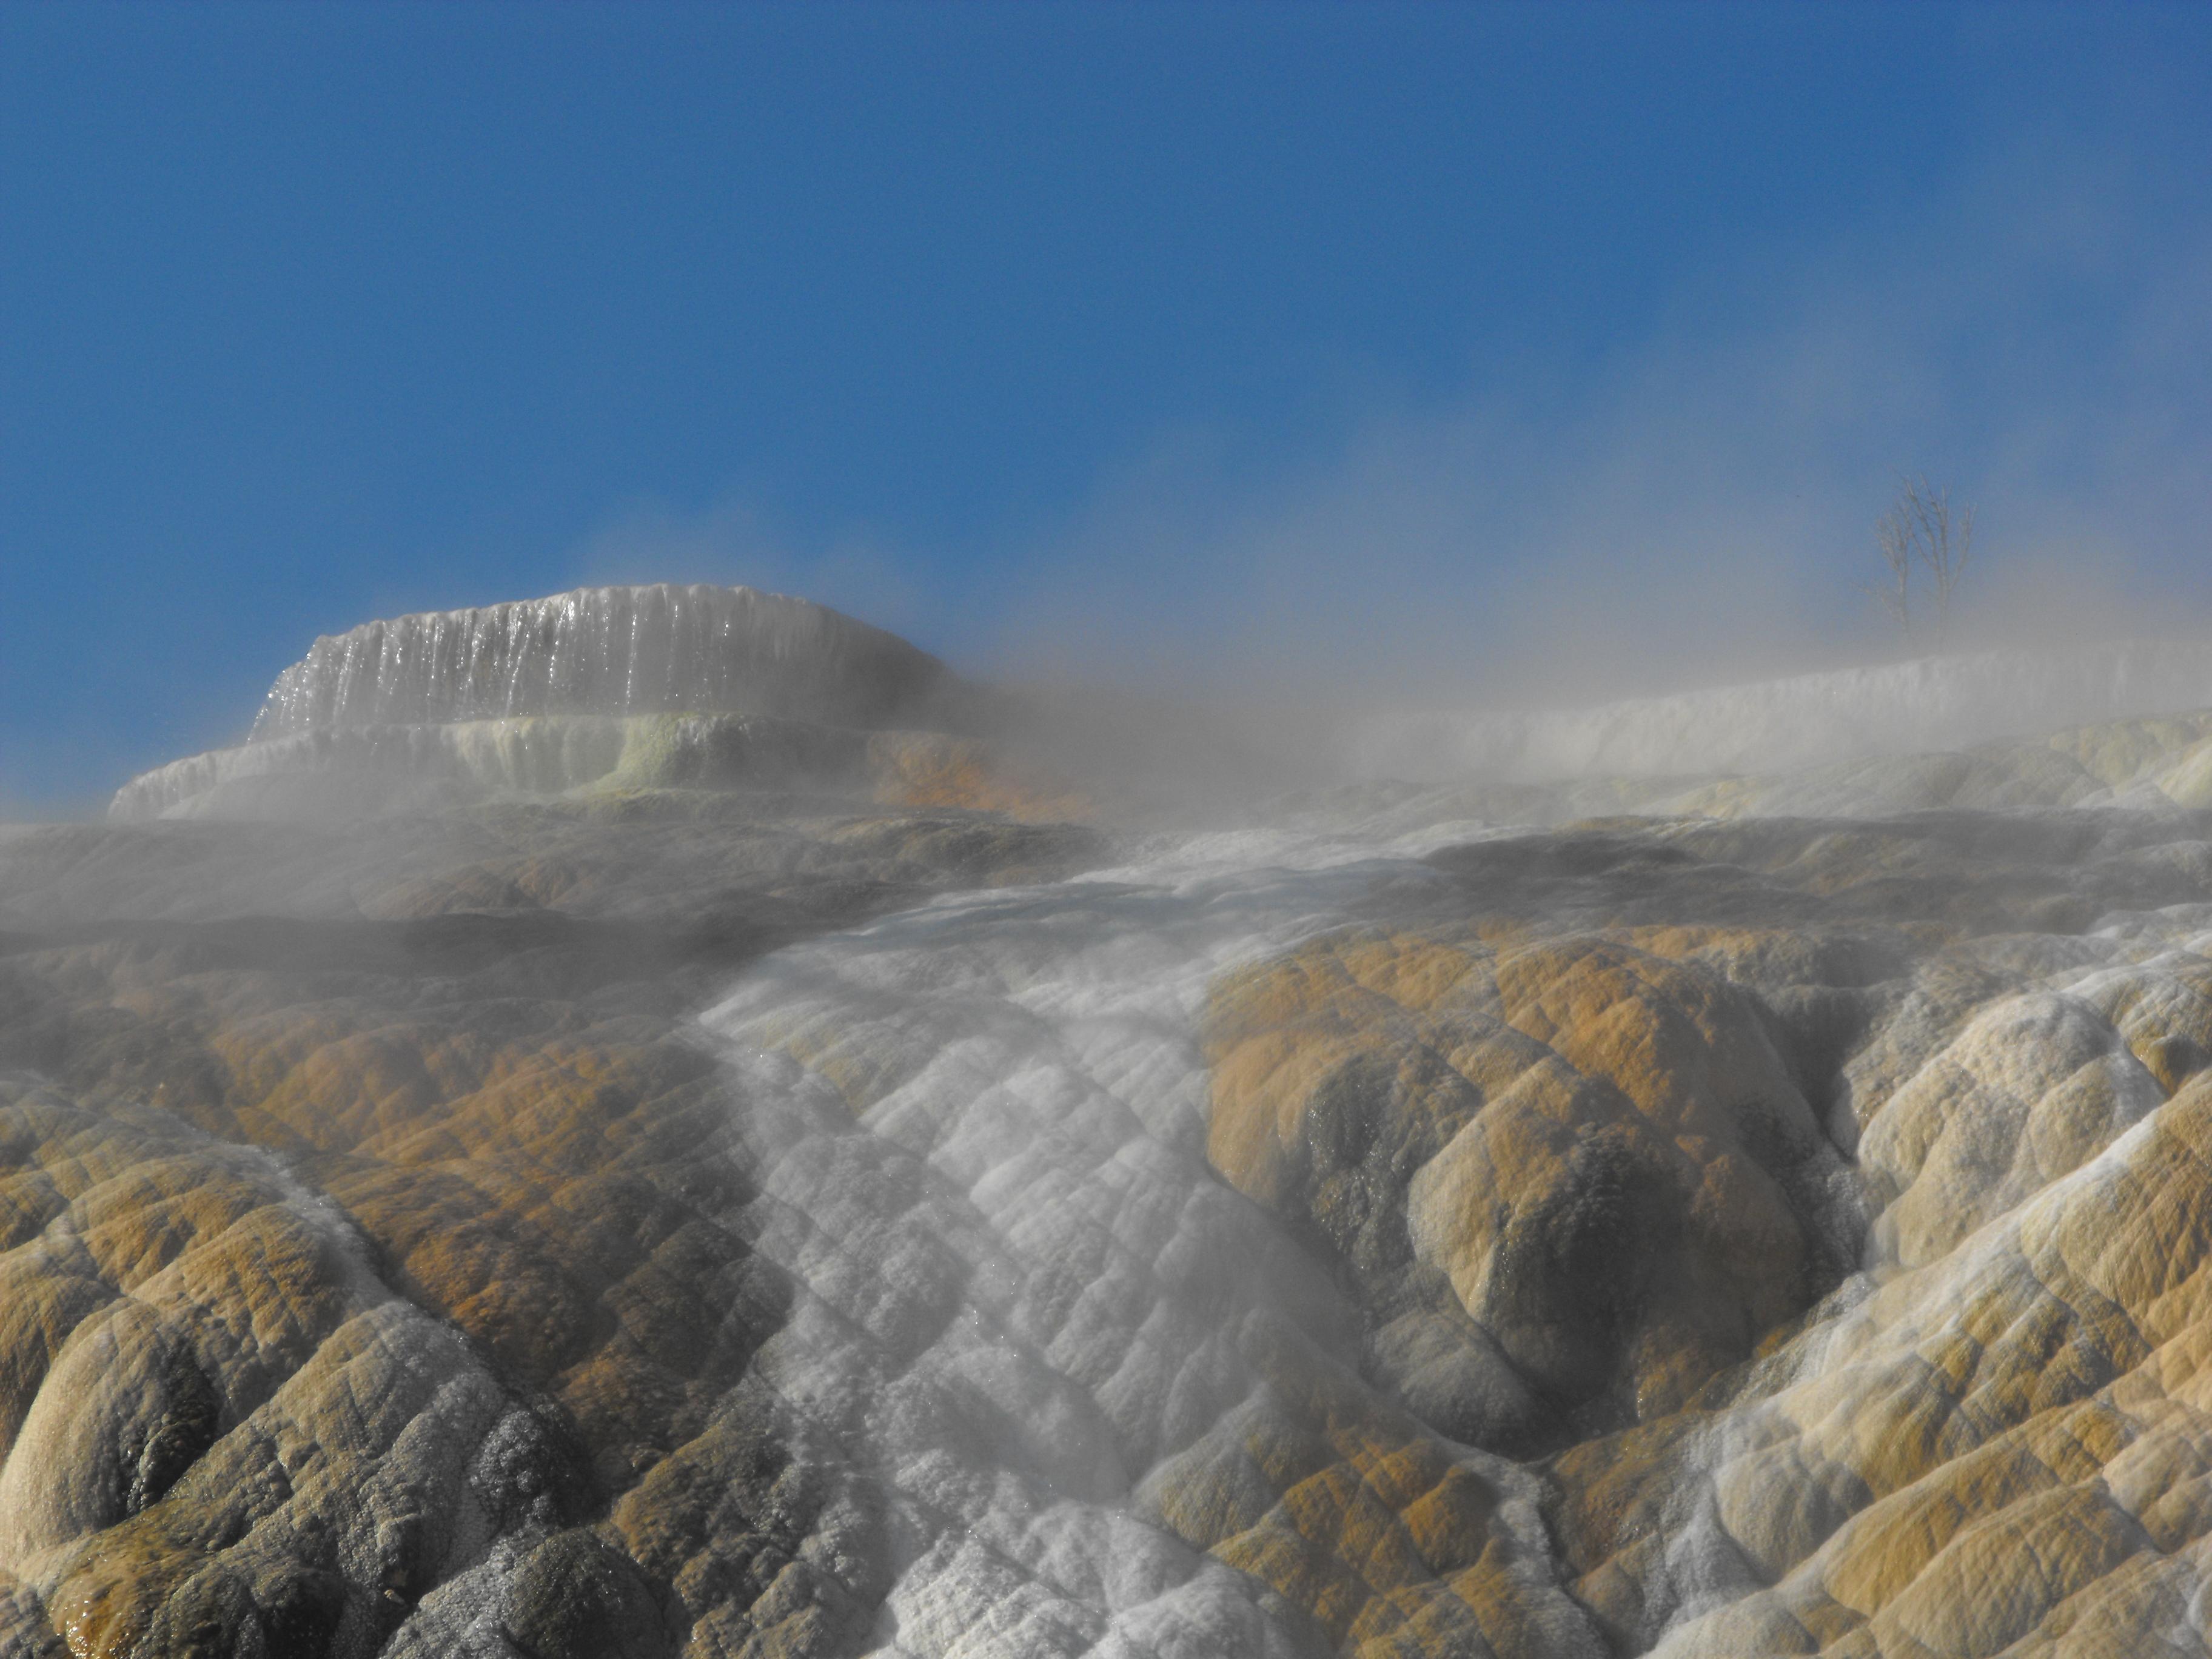 yellowstone, yellowstone national park, springs